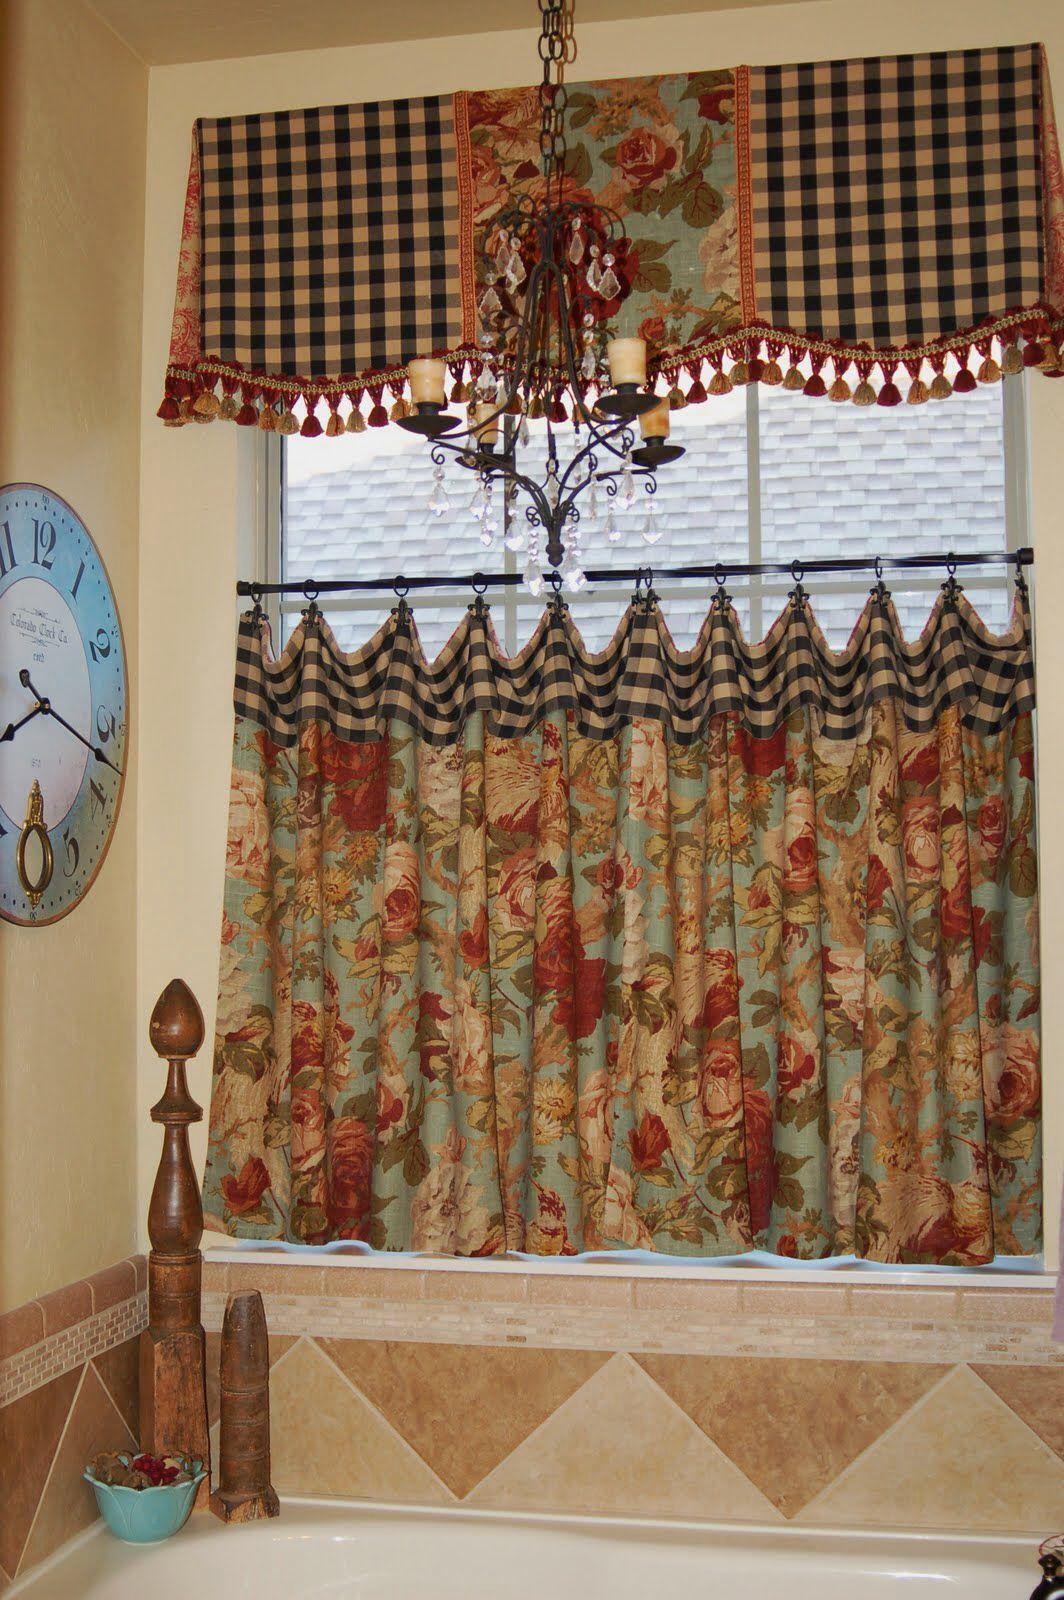 Cortina para la cocina | Cortinas | Pinterest | Curtain ideas ...